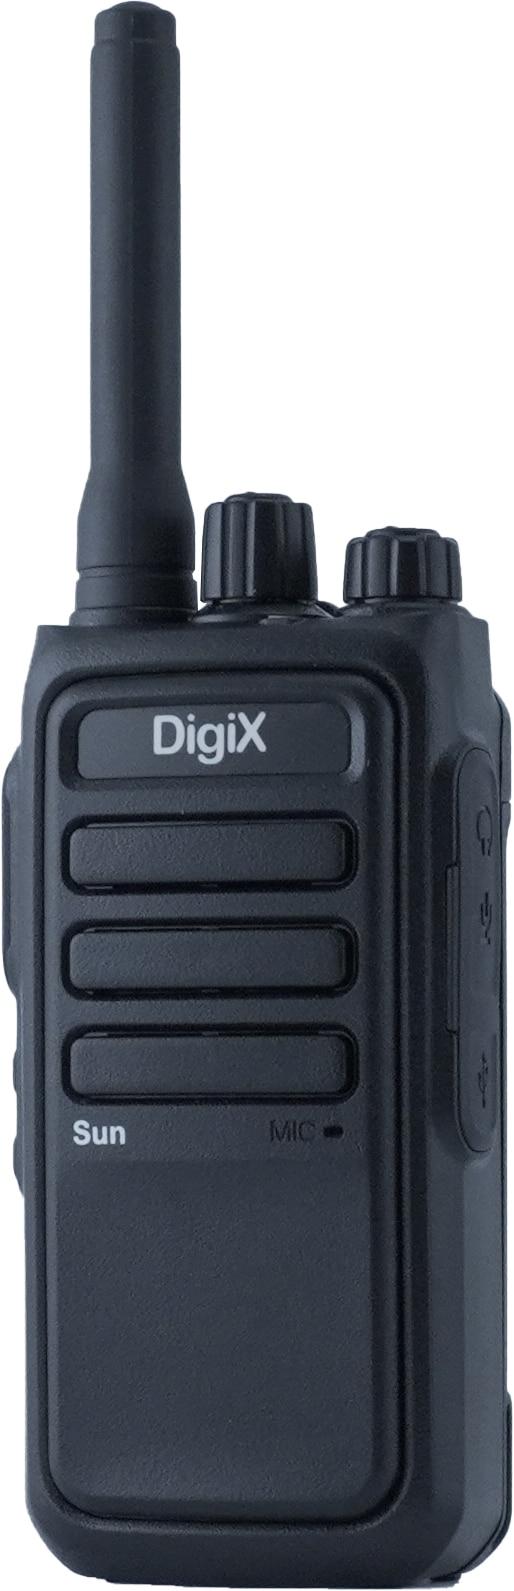 DigiX Sun Black Front